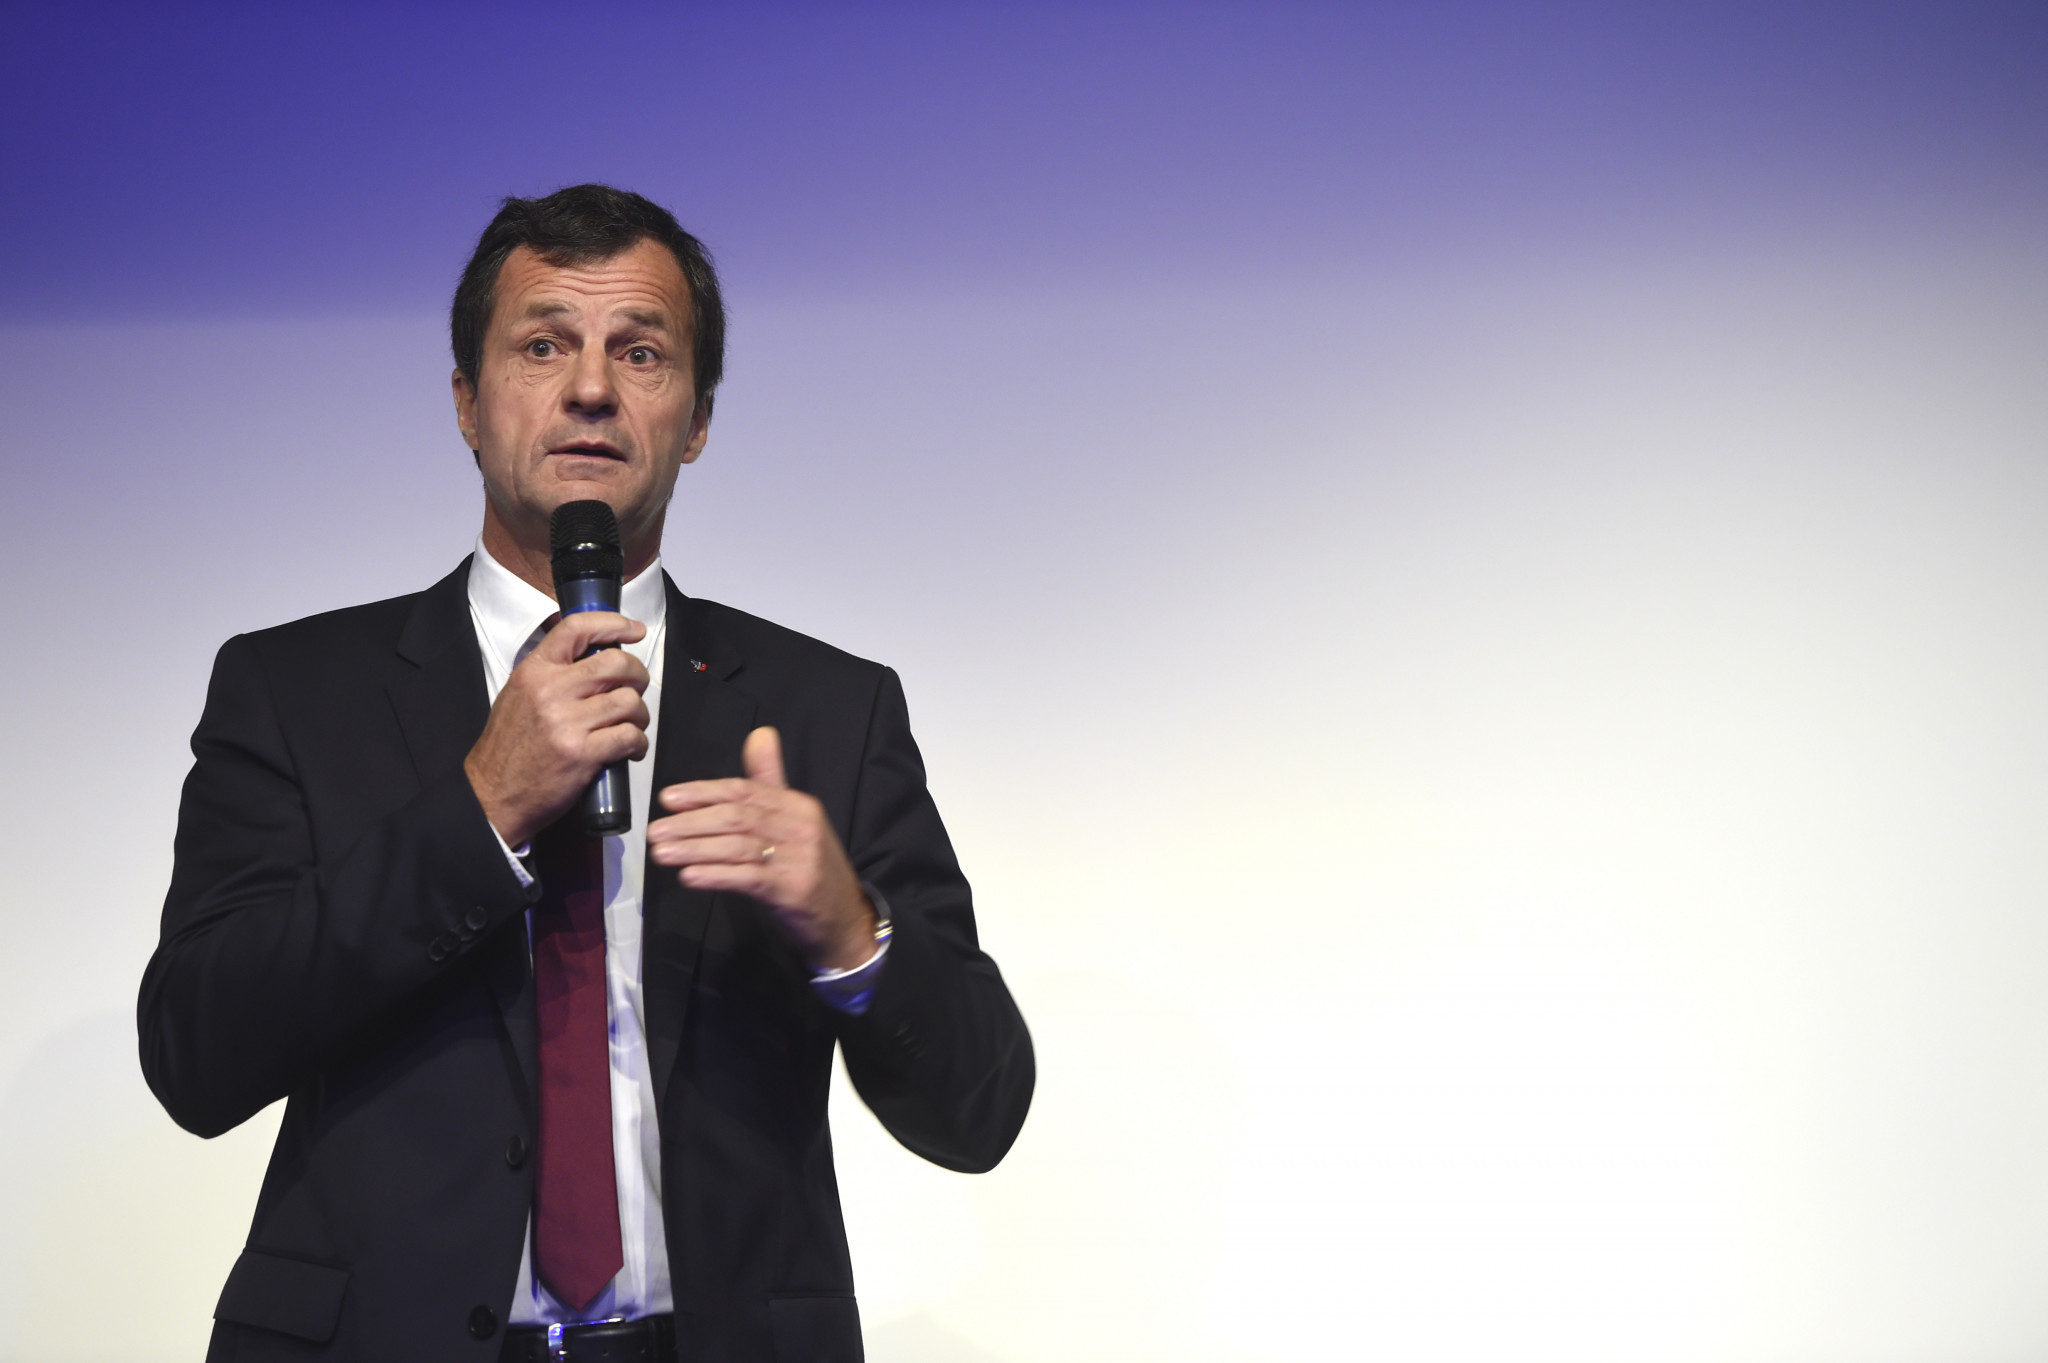 Vion announced as new International Ski Federation secretary general following virtual meeting